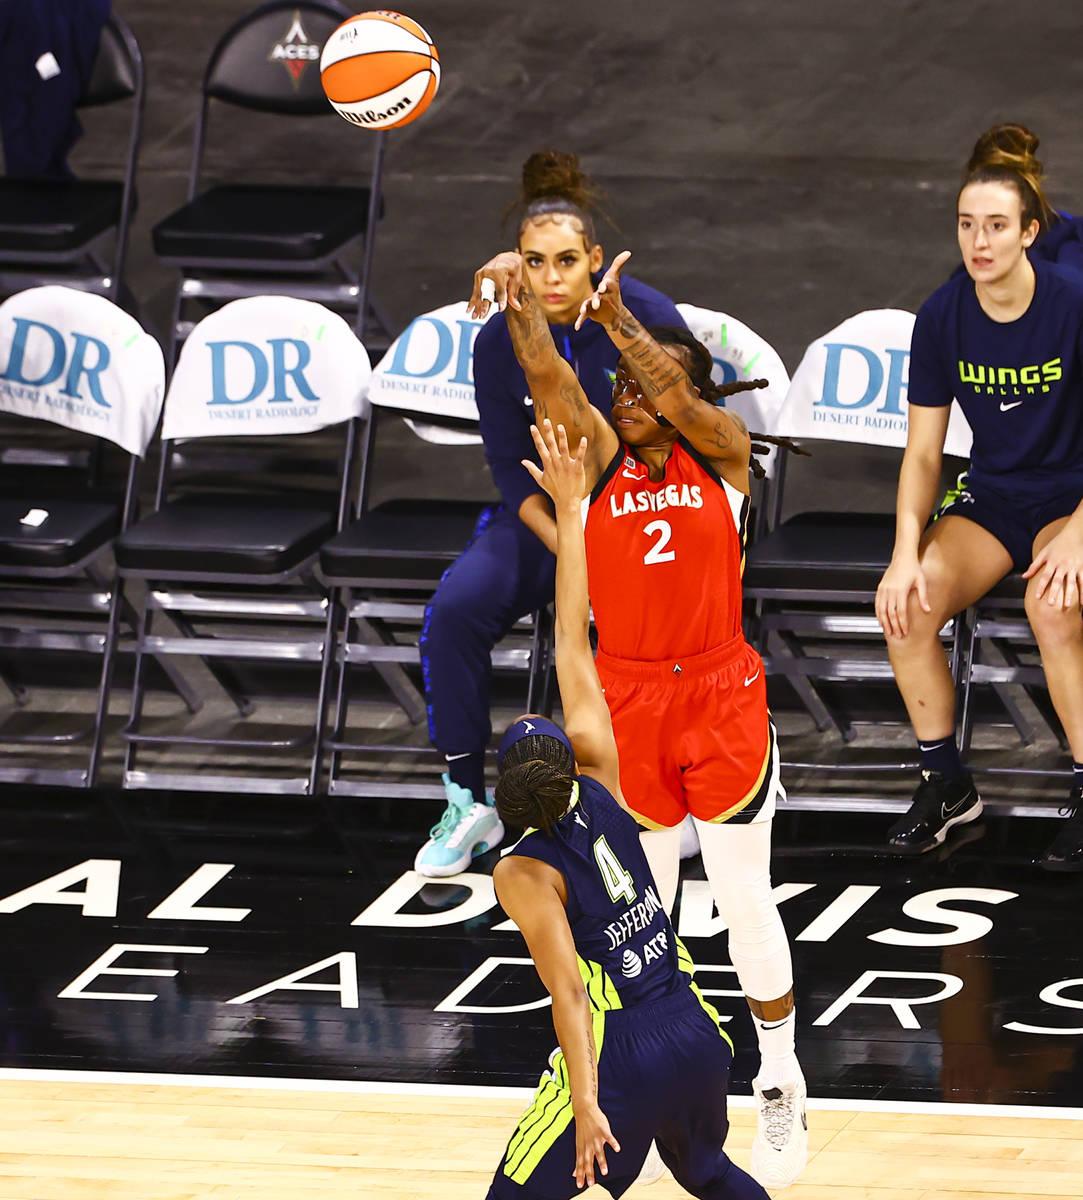 Las Vegas Aces' Riquna Williams (2) shoots over Dallas Wings' Moriah Jefferson (4) during the f ...